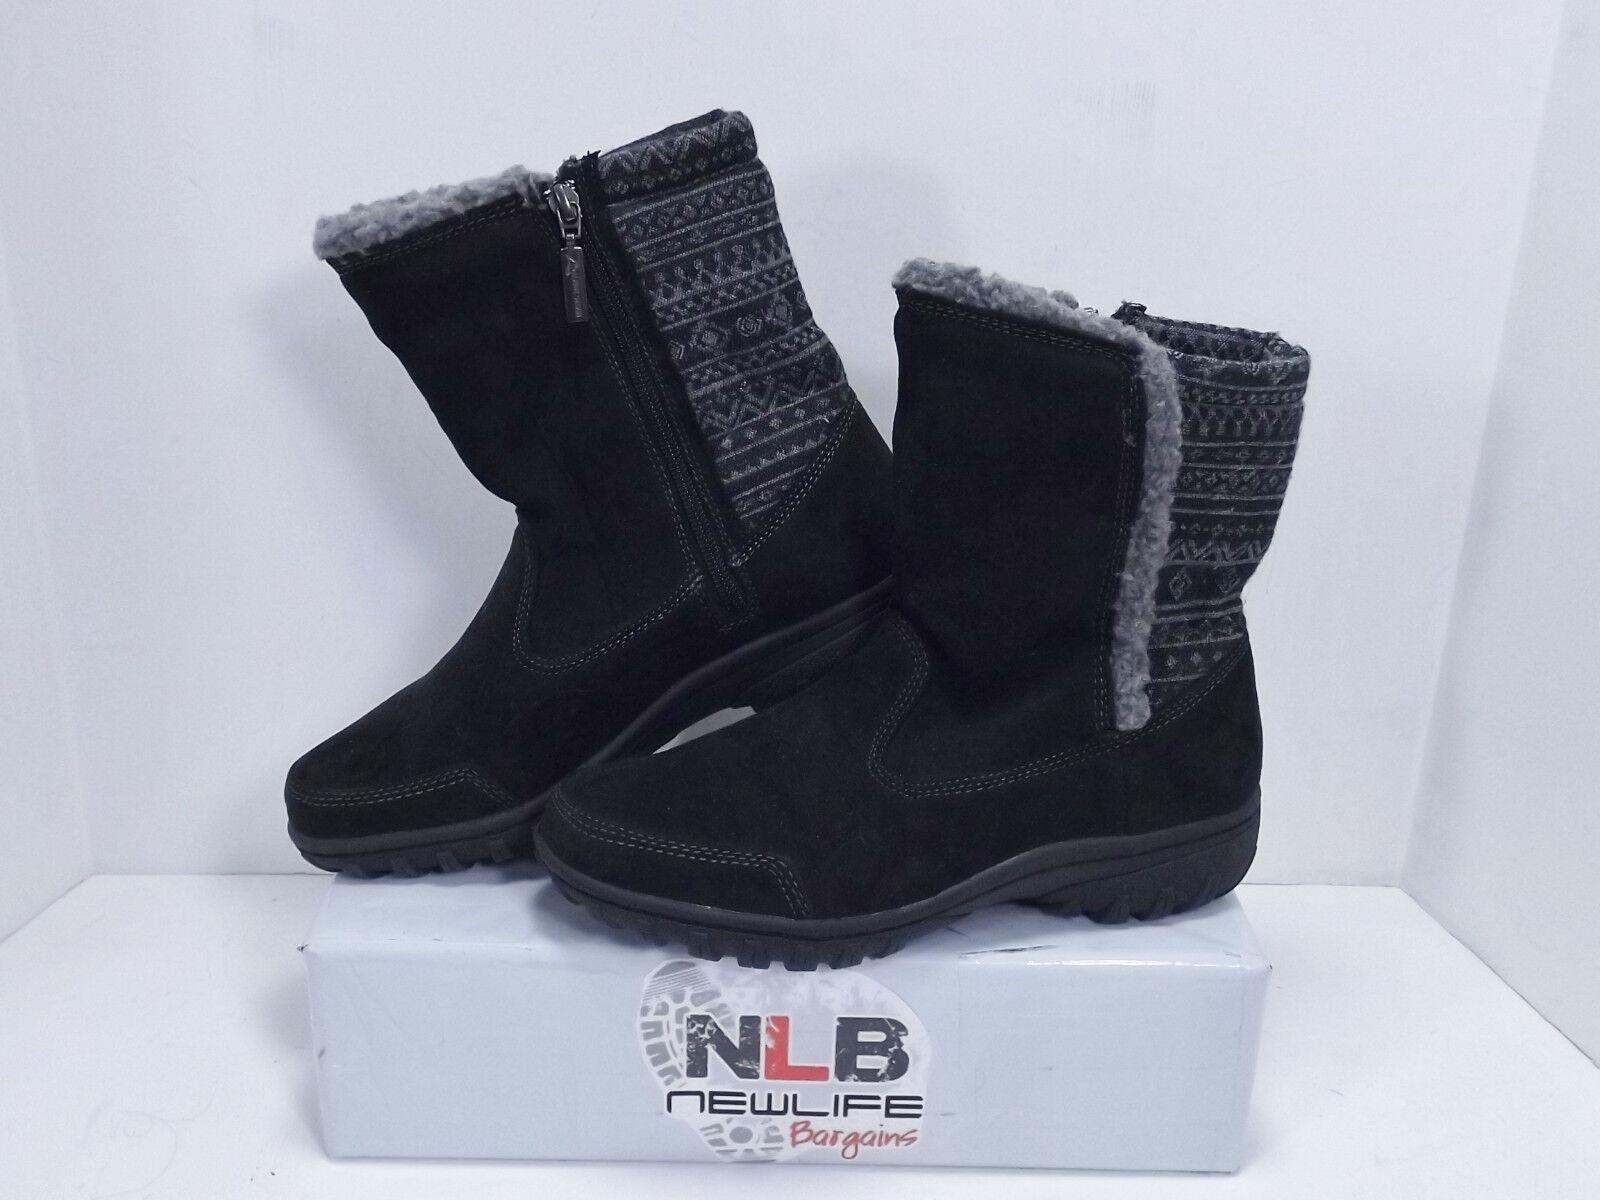 Alpine Design Caldwell Boots JW2512 Black Women's Size 8